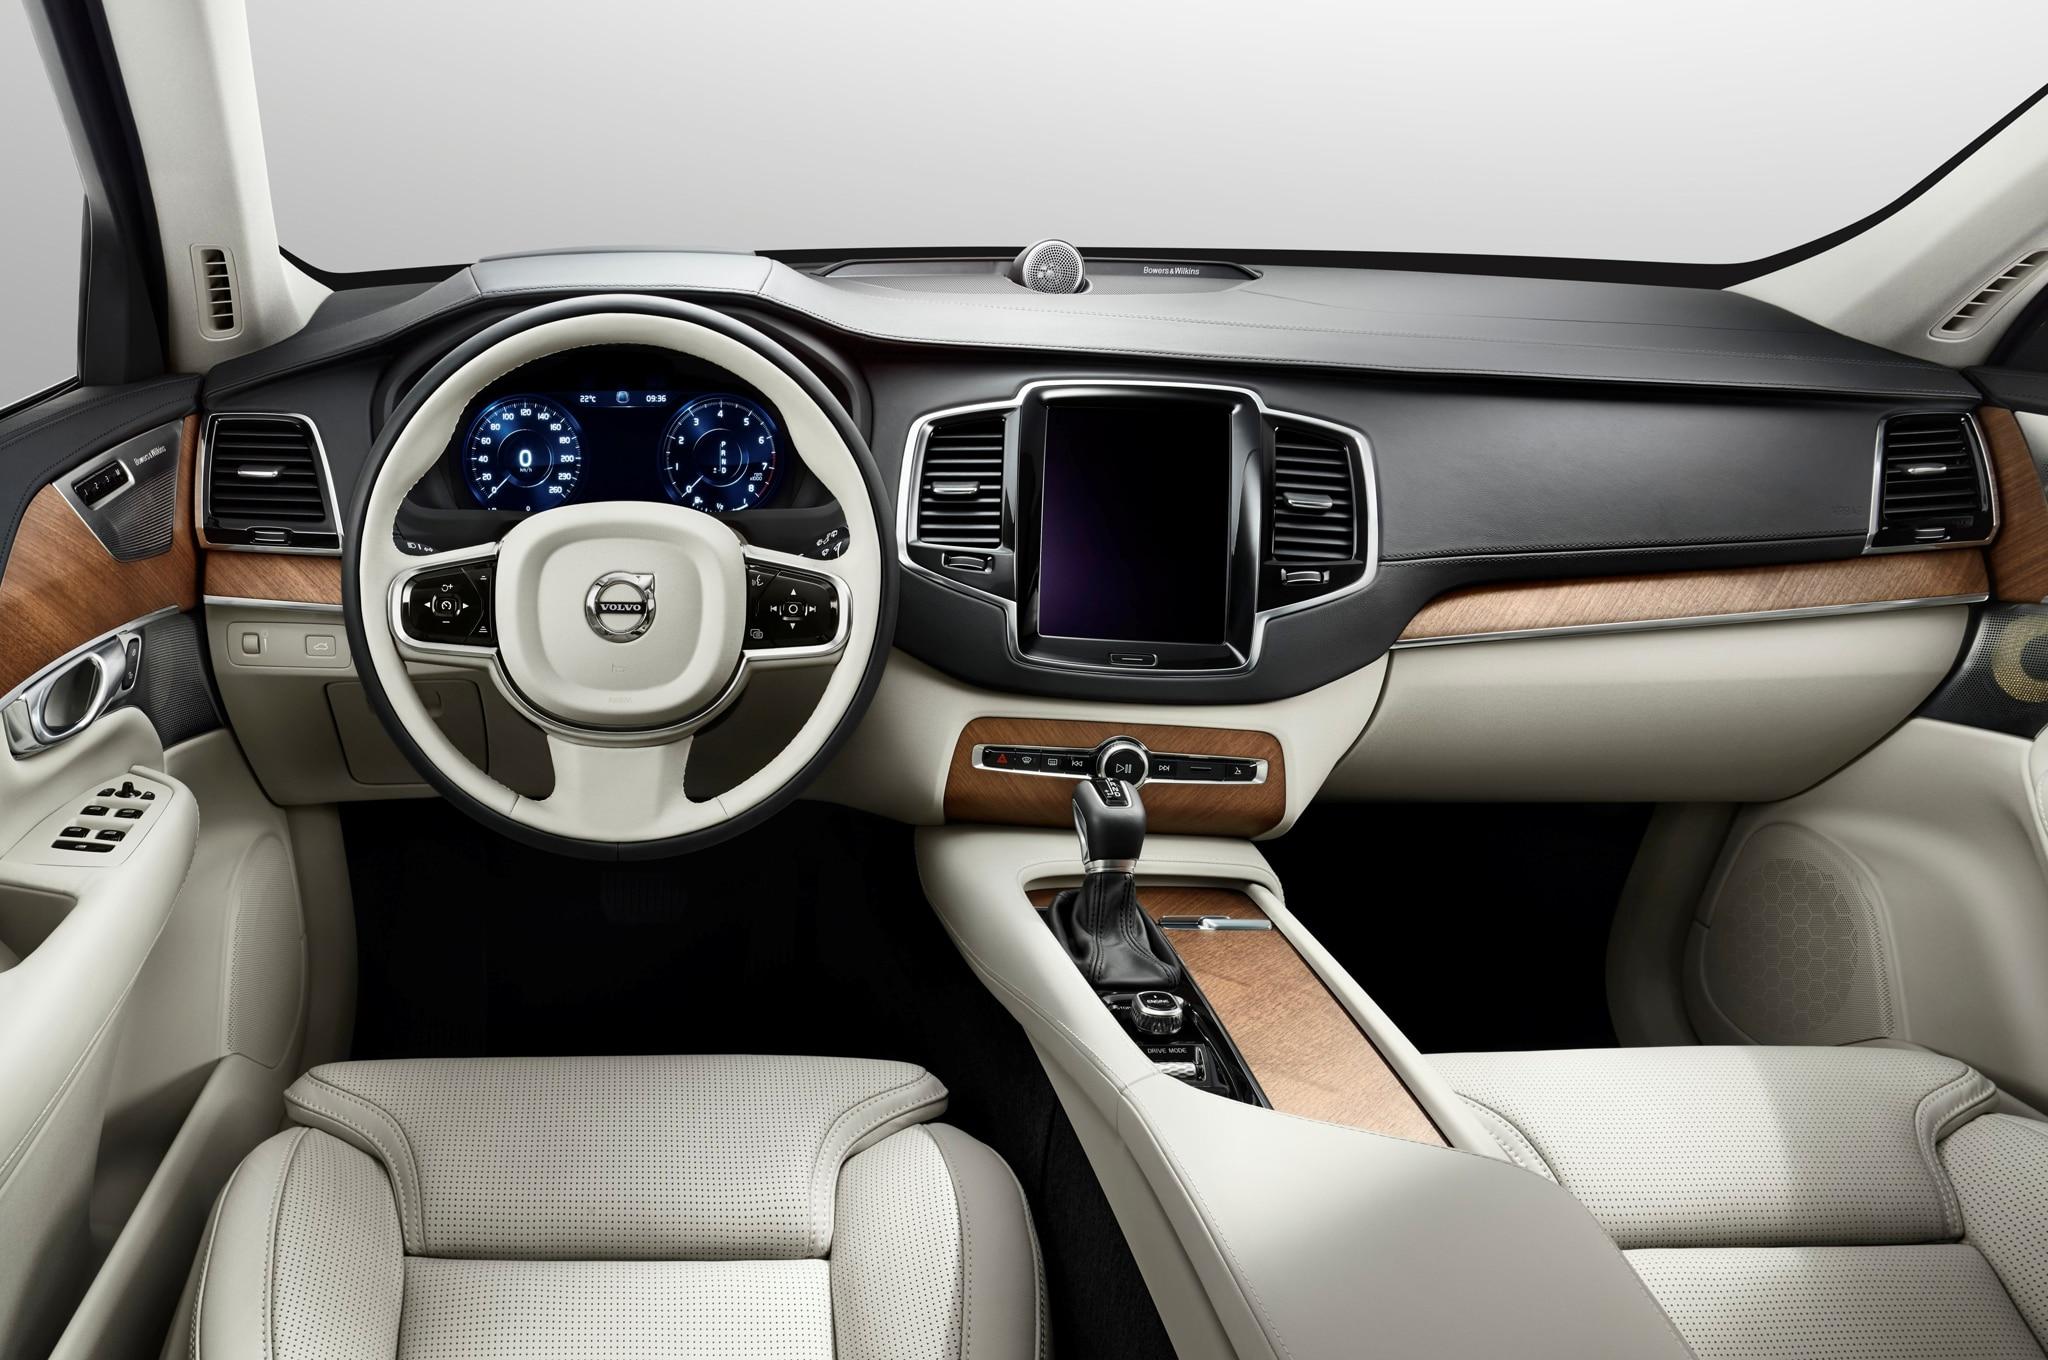 2015 Volvo Xc90 Dashboard1